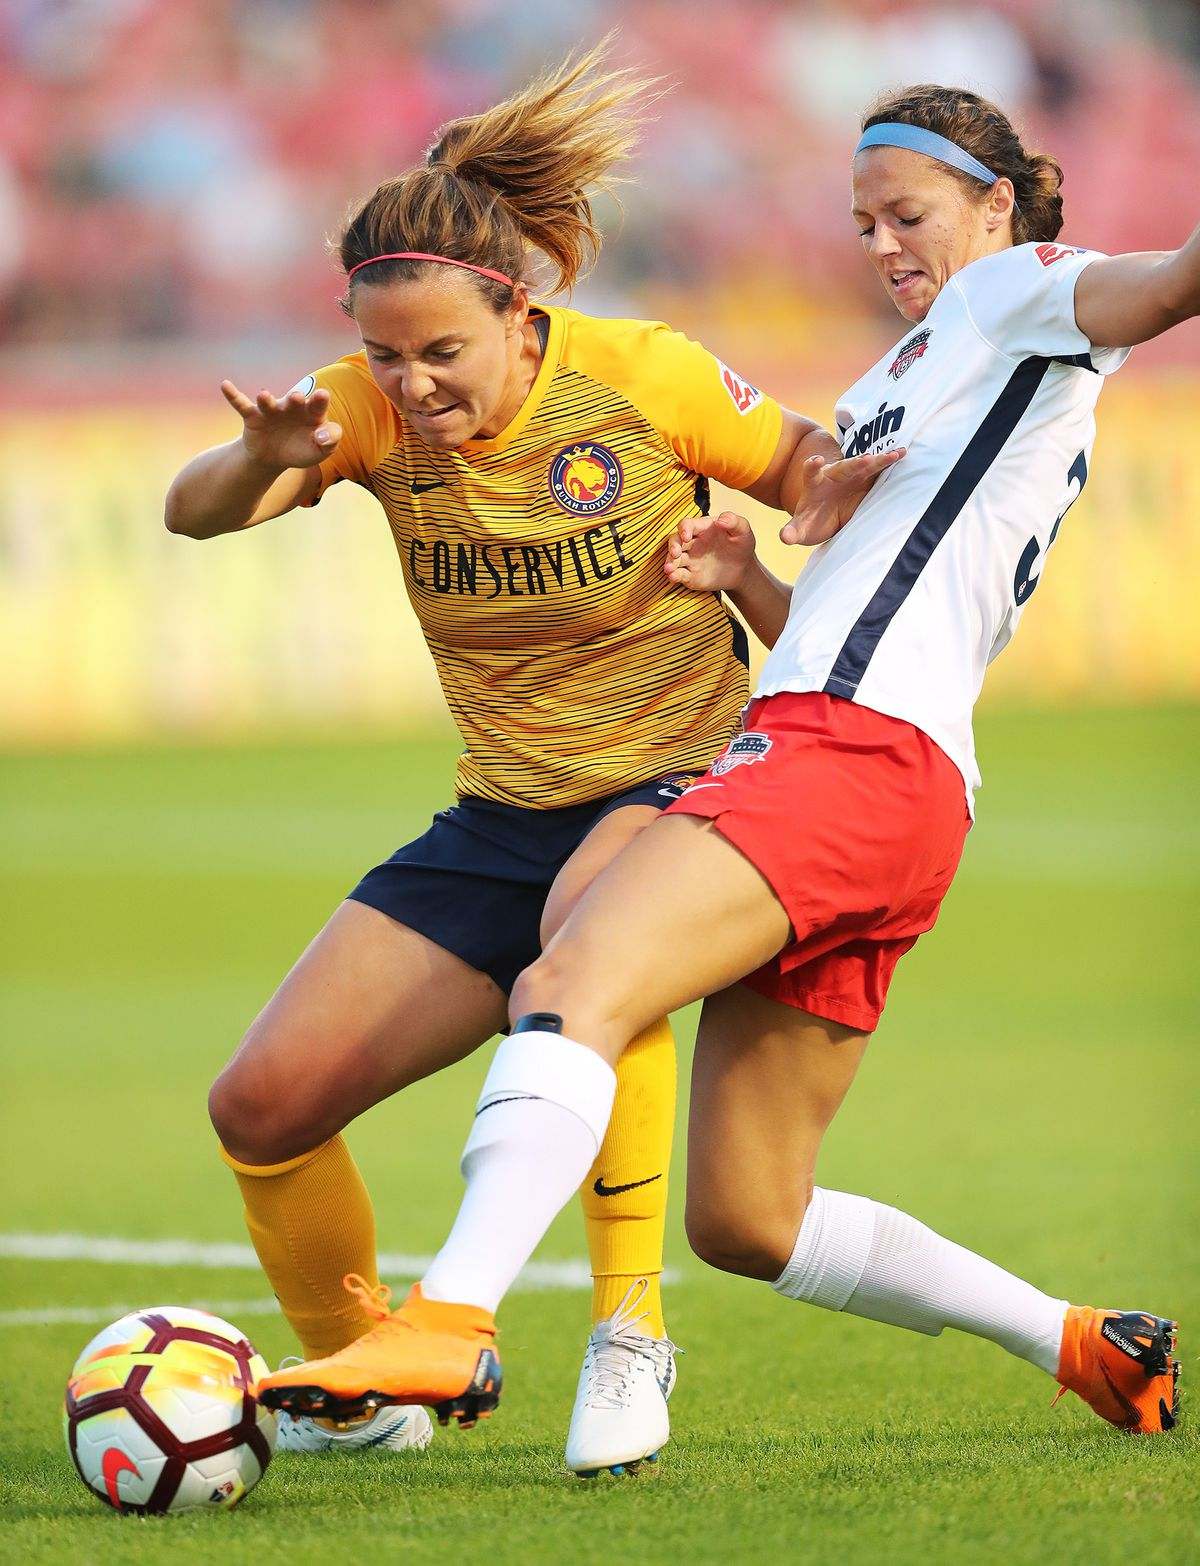 Utah Royals FC defender Rachel Corsie, left, battles Washington Spirit forward Ashley Hatch for the ball as the Utah Royals and Washington Spirit play at Rio Tinto Stadium in Sandy on Wednesday, Aug. 8, 2018.